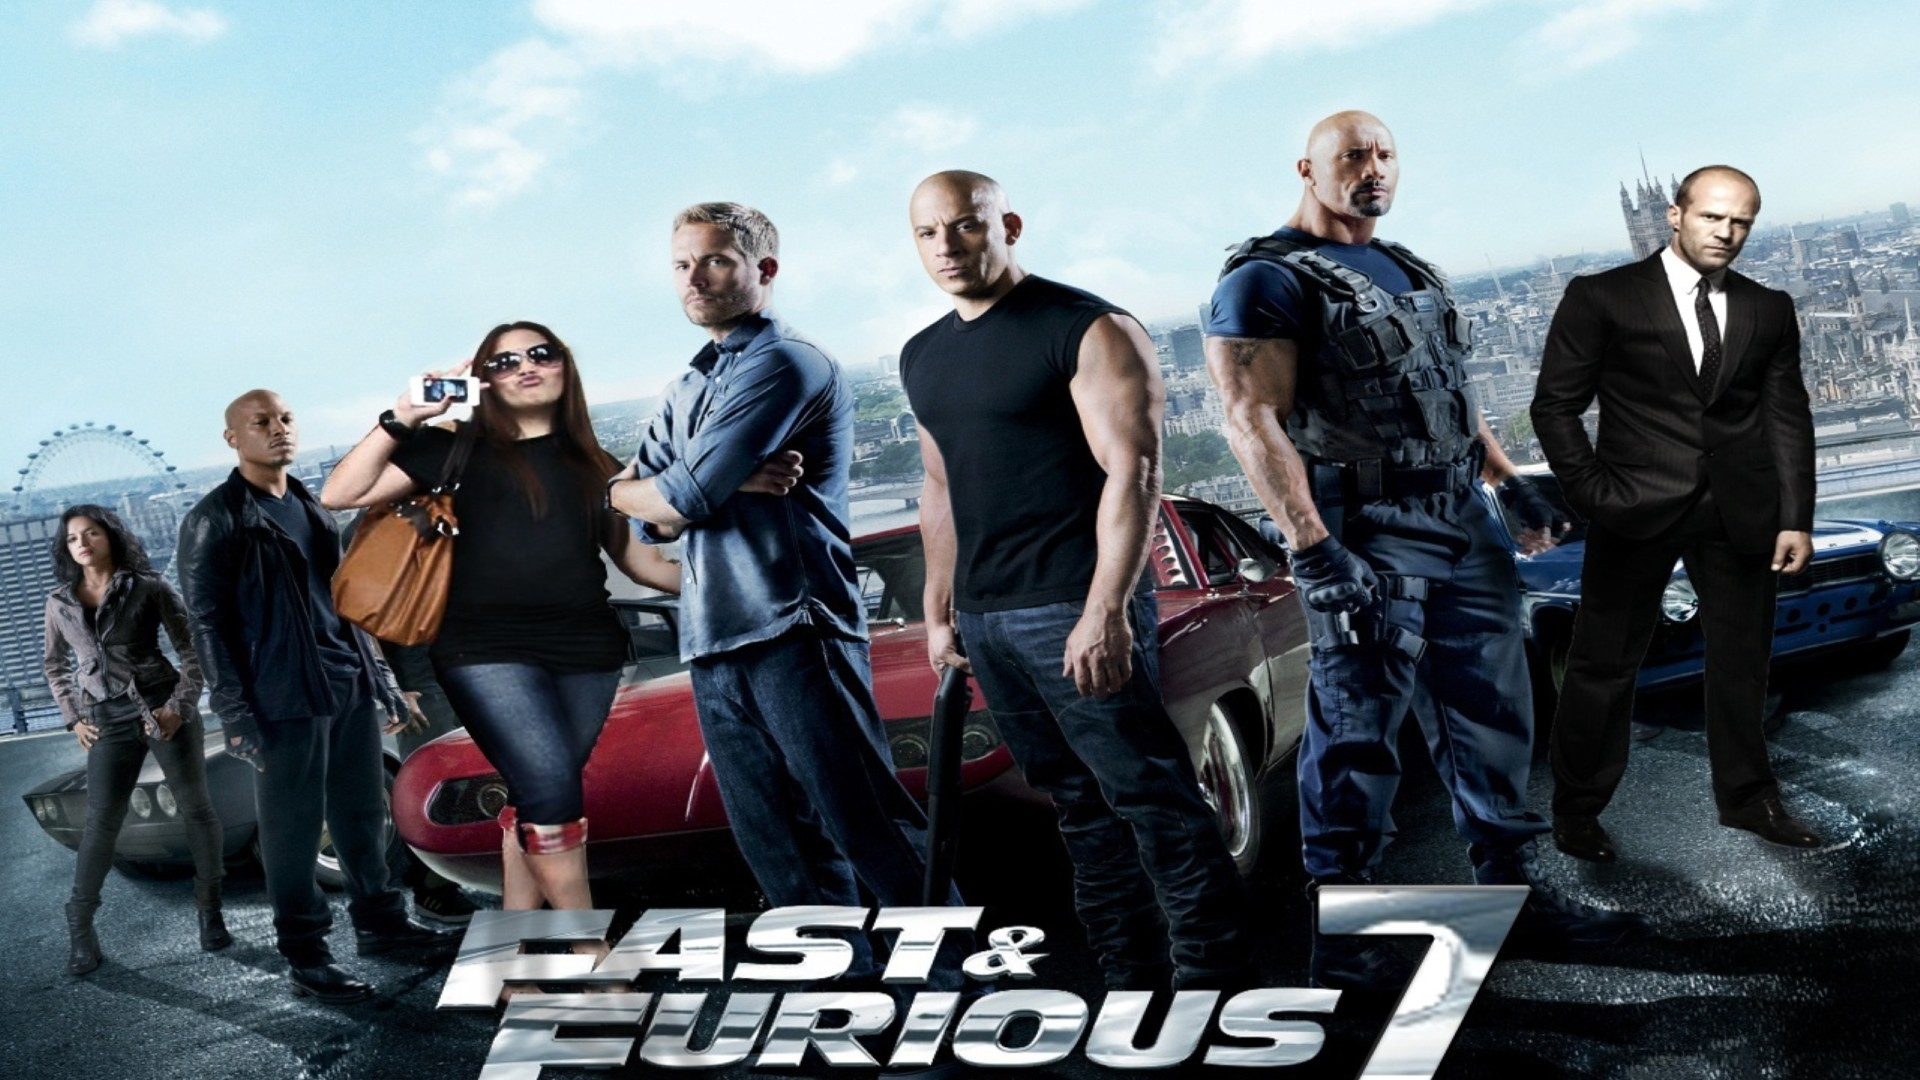 Furious 7 2015 Movie Wallpapers Download Desktop Wallpaper 1920x1080